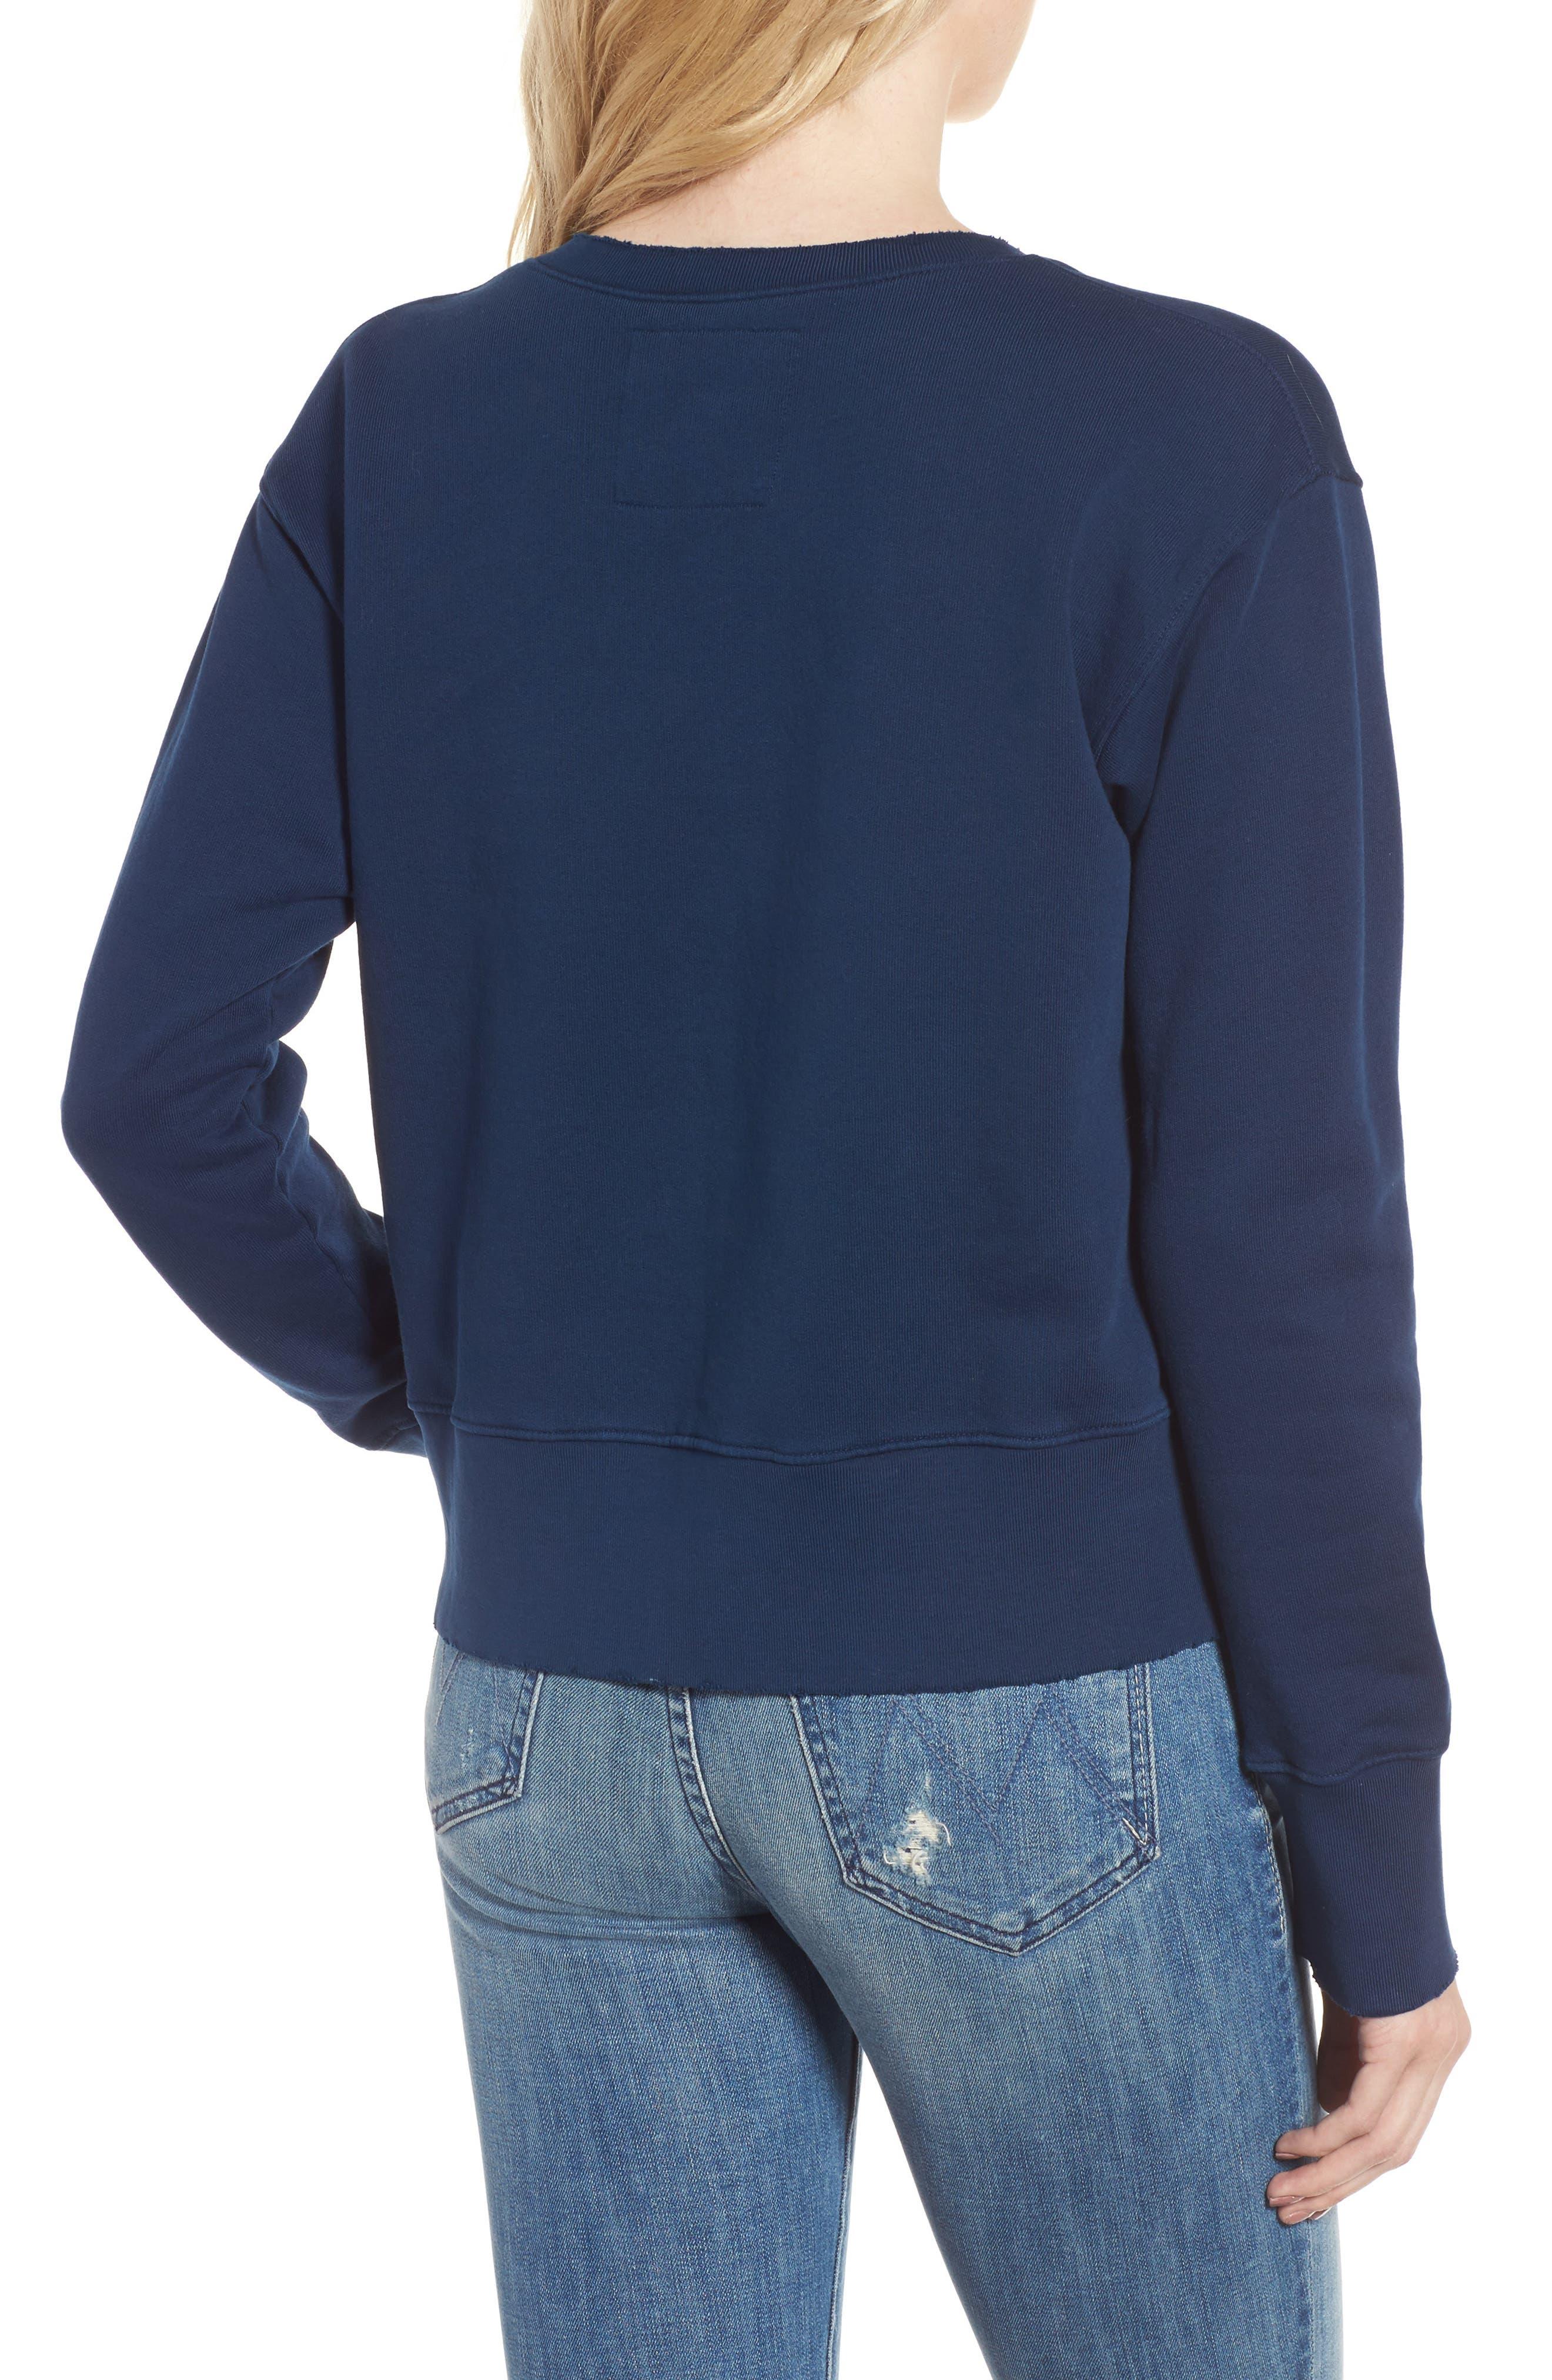 Distressed Sweatshirt,                             Alternate thumbnail 2, color,